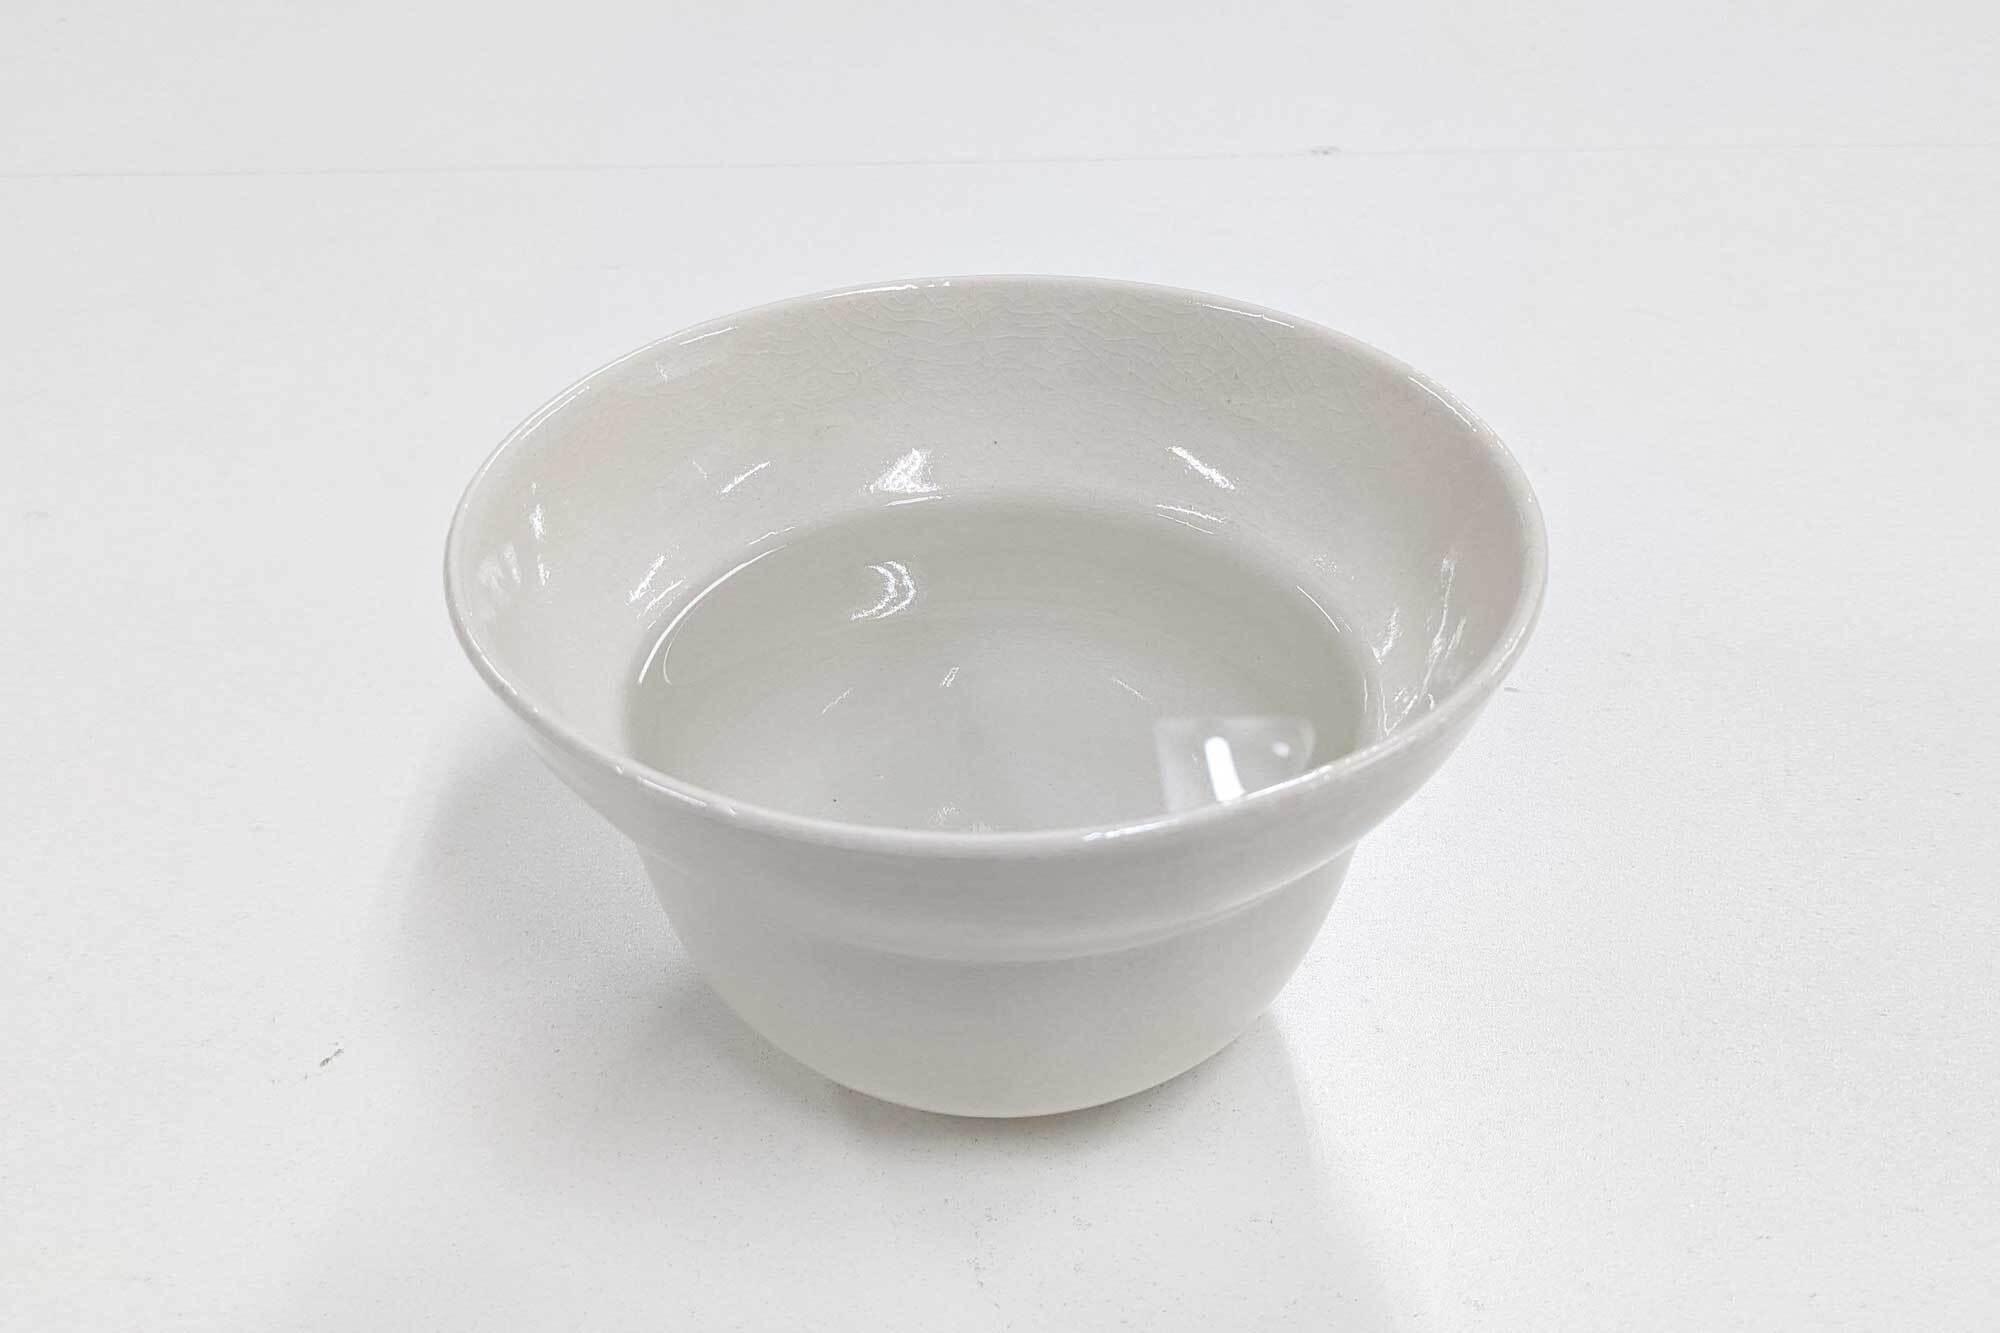 CANASA 貫入釉麺鉢